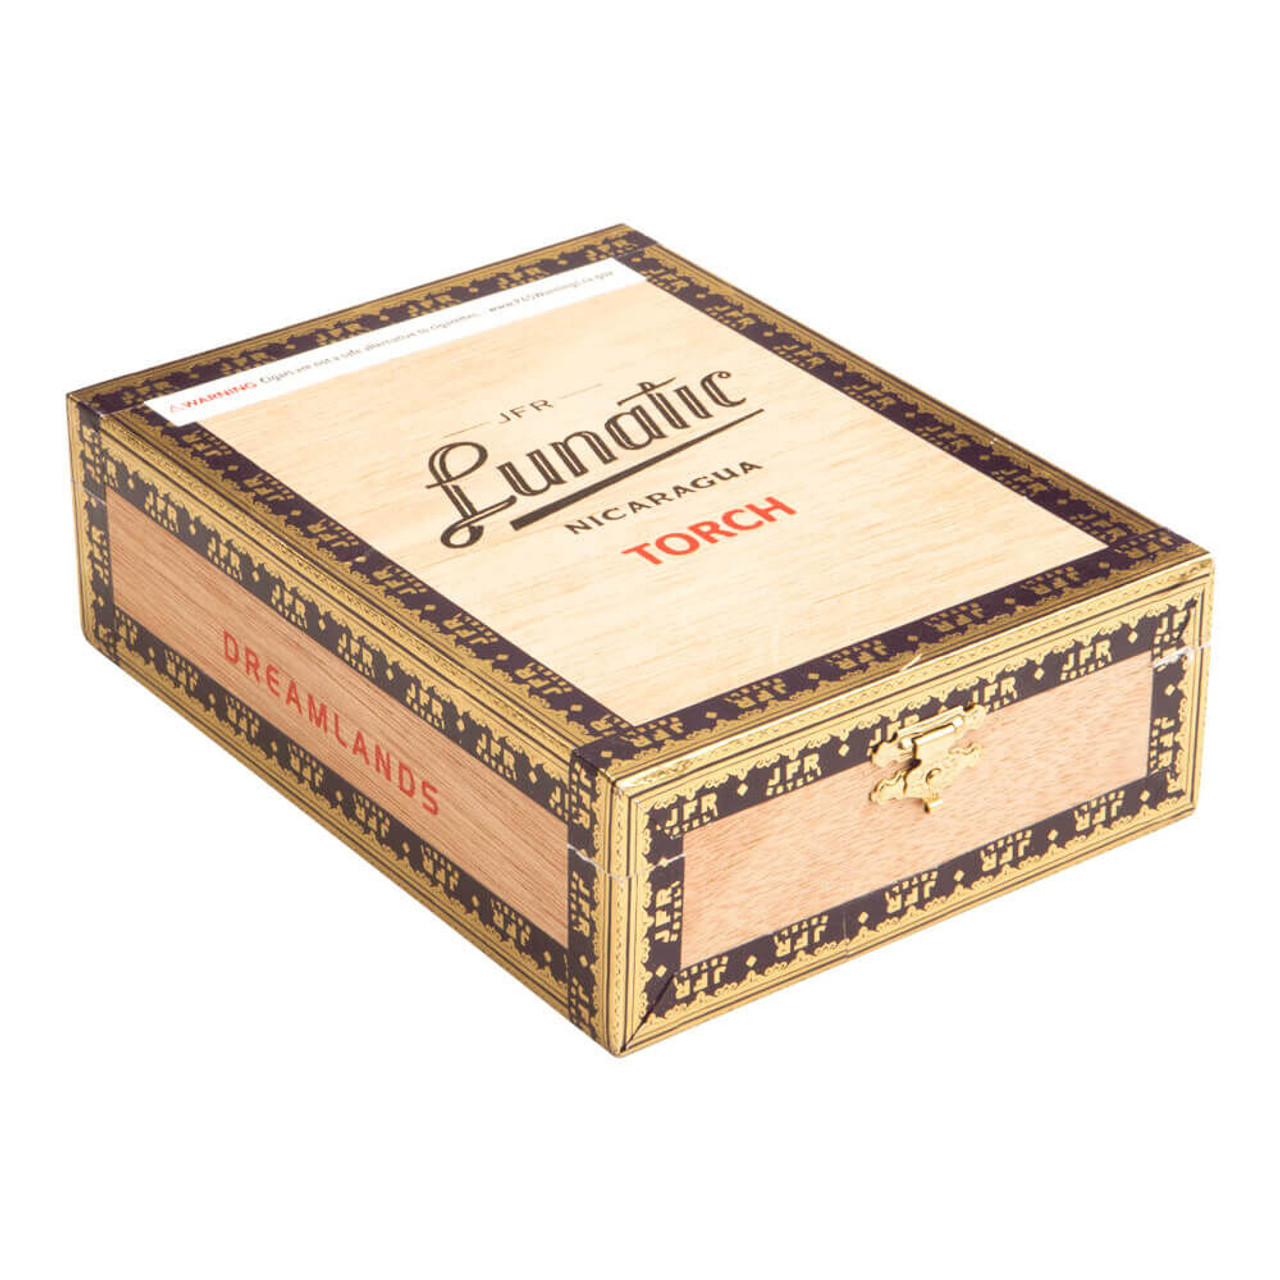 Casa Fernandez JFR Lunatic Torch Dreamlands Cigars - 6.5 x 60 (Box of 10)